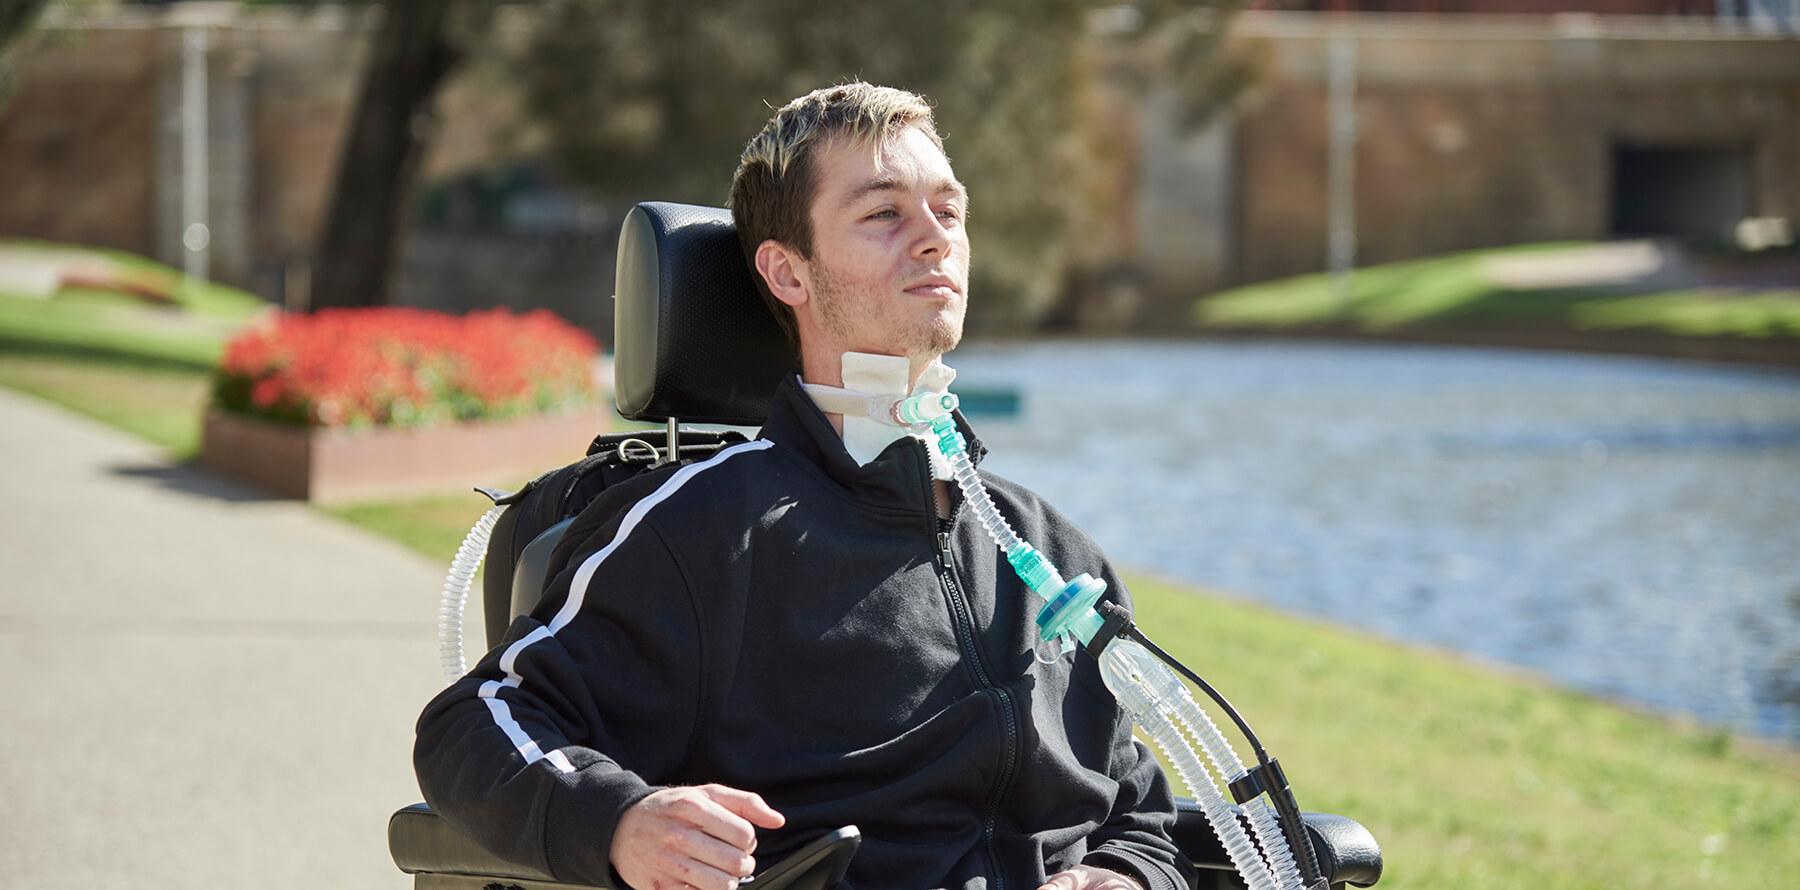 restrictive-lung-disease-patient-outcomes